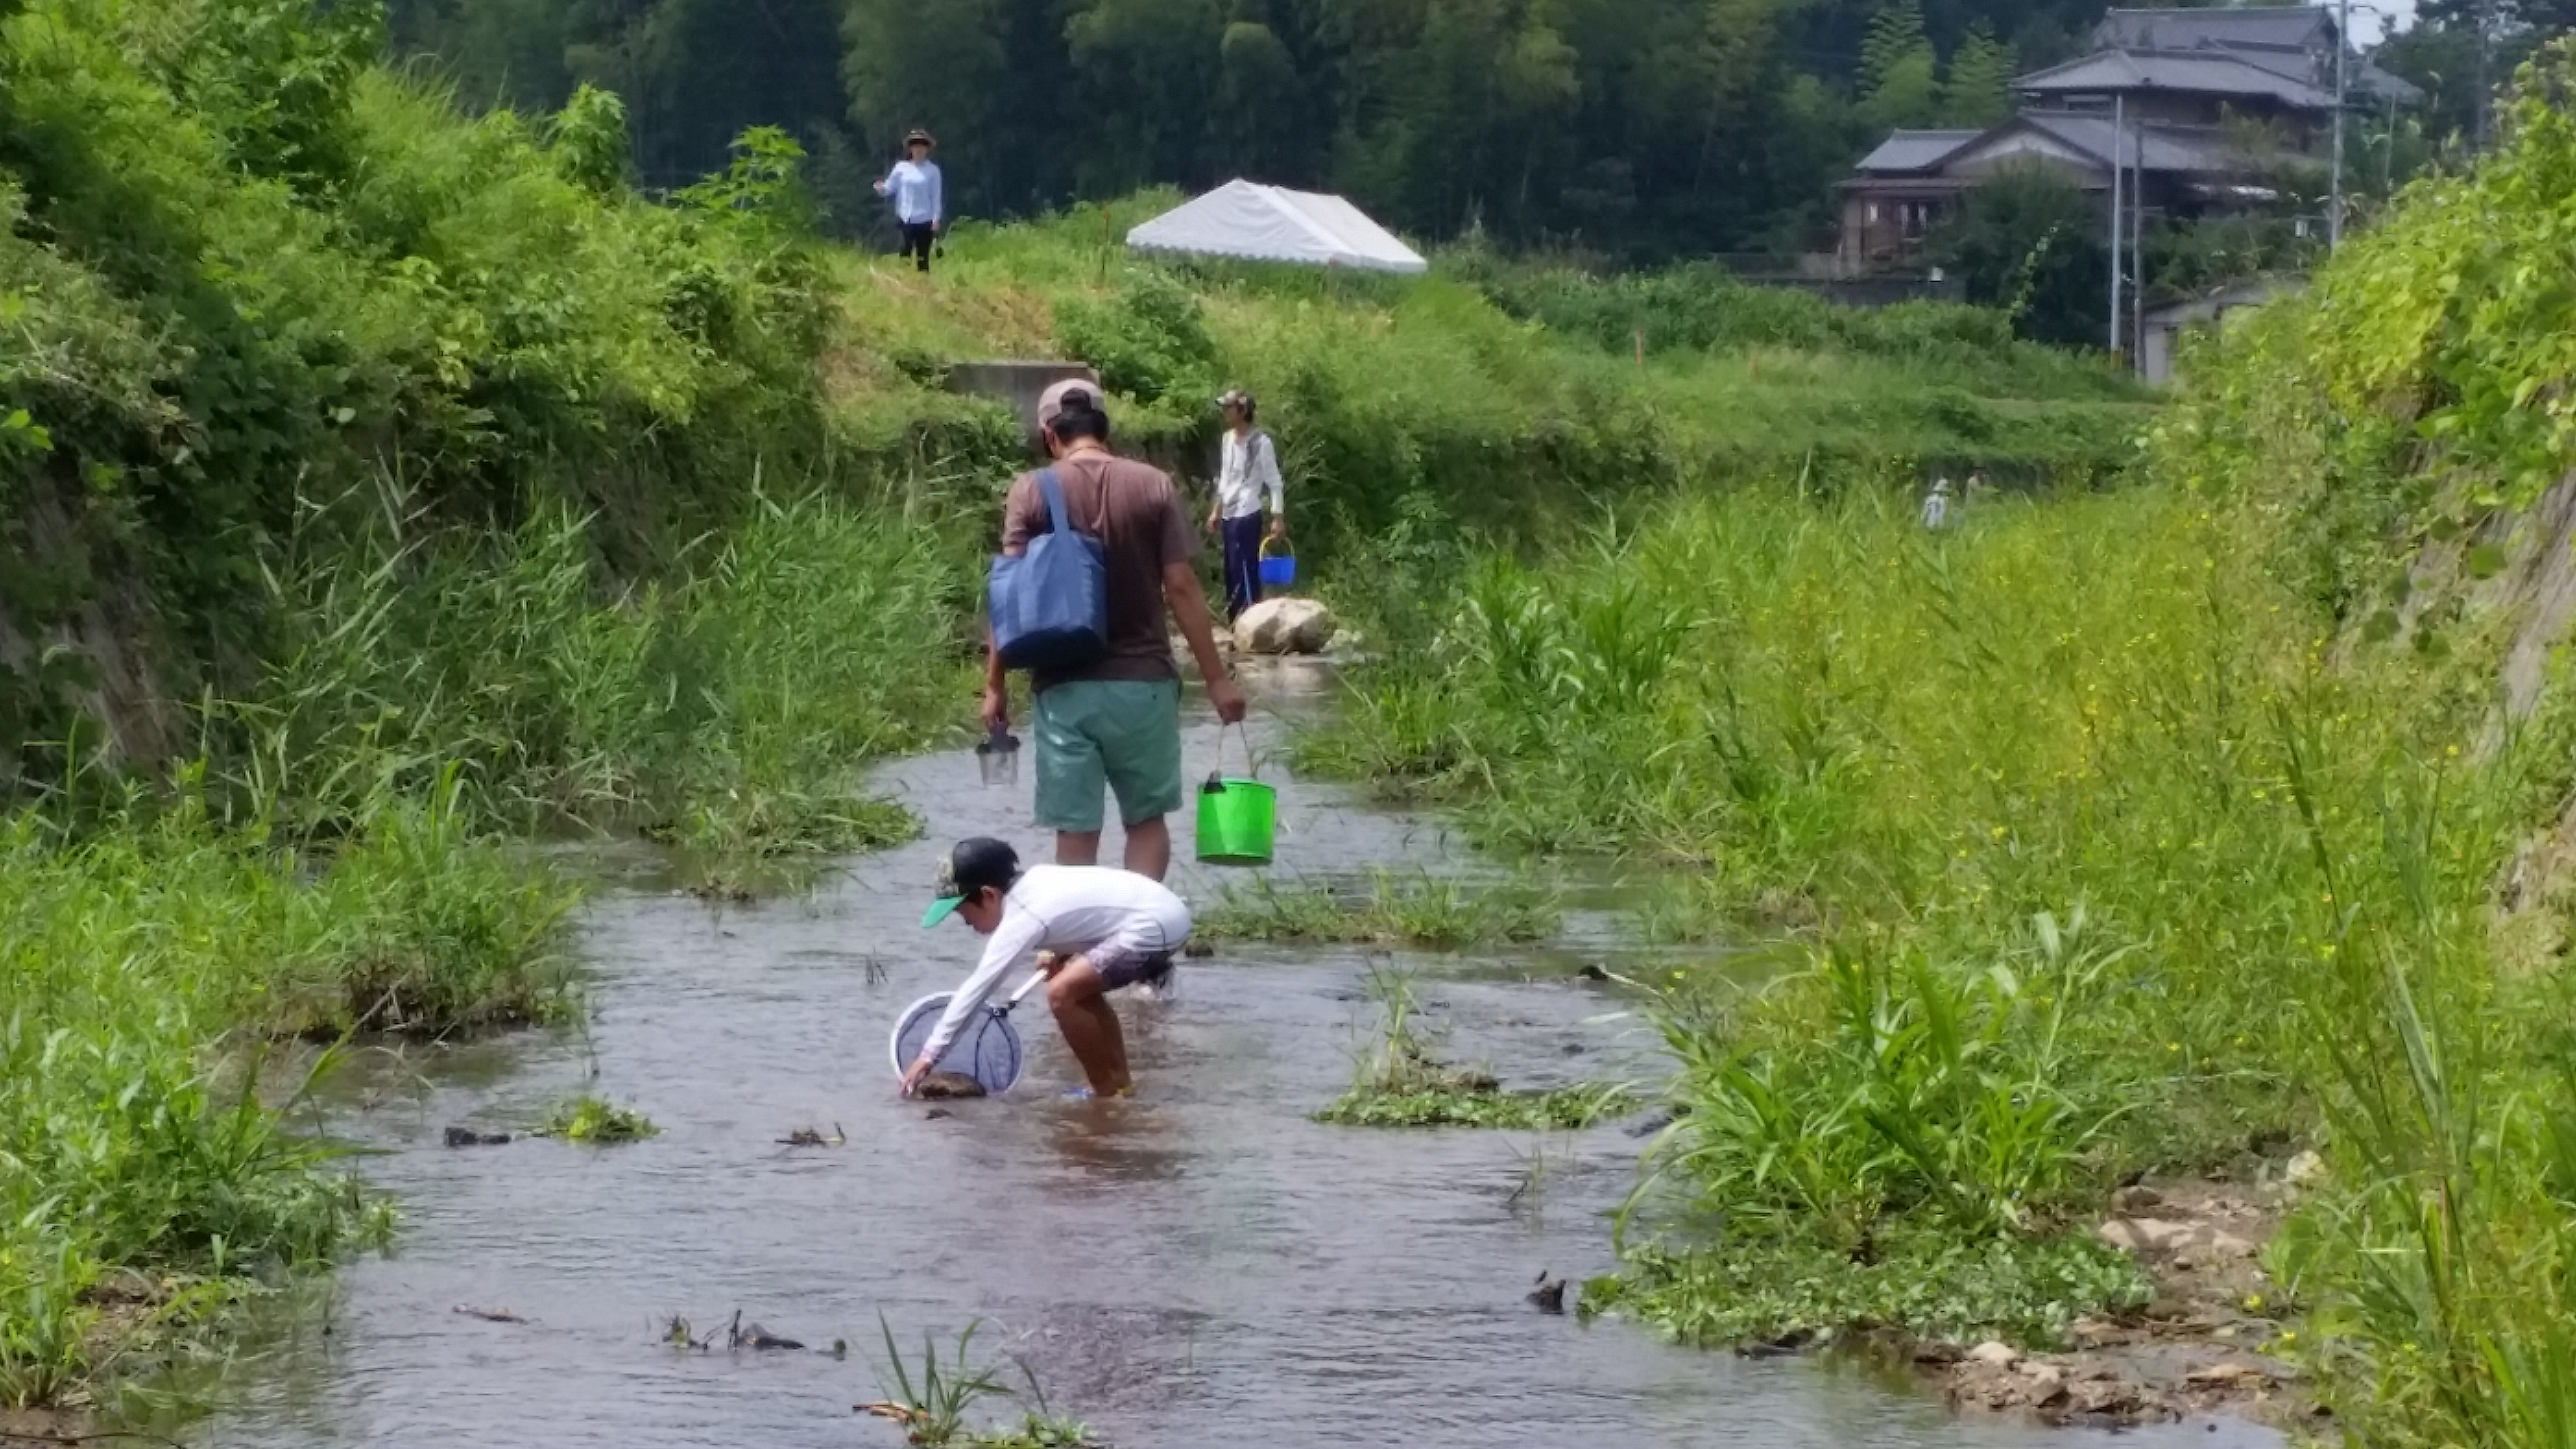 8月20日実施の岩本川探検隊